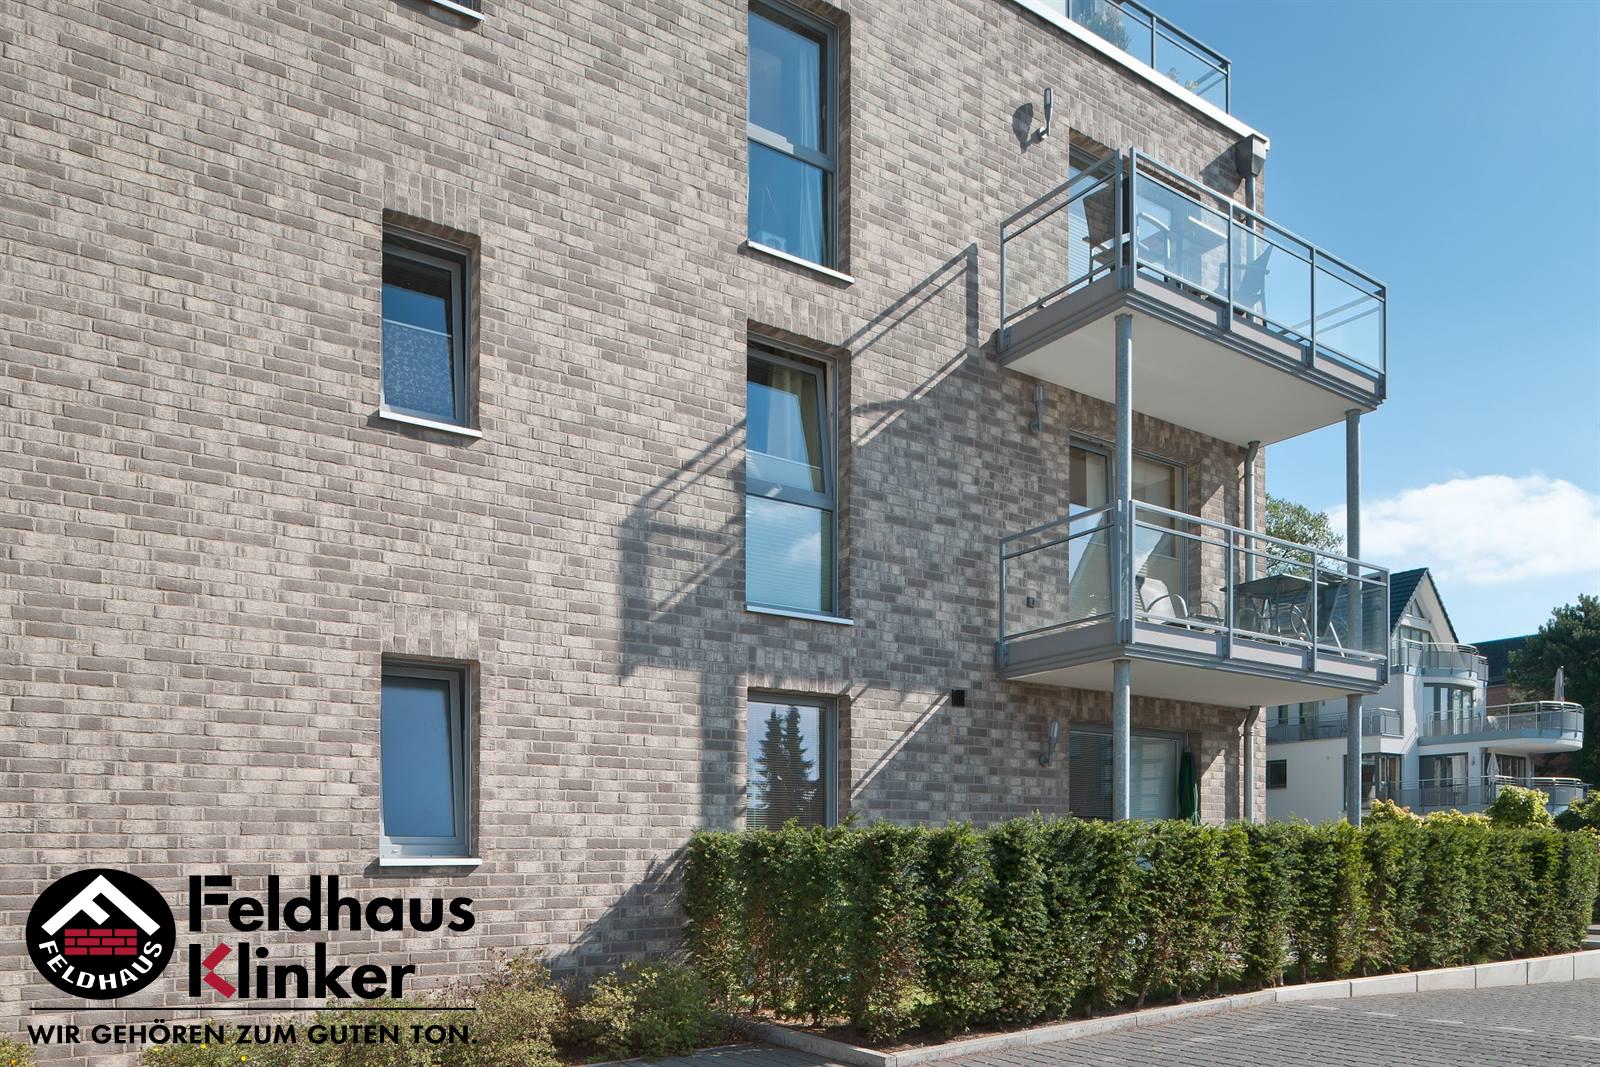 682 Feldhaus Klinker Sintra 11